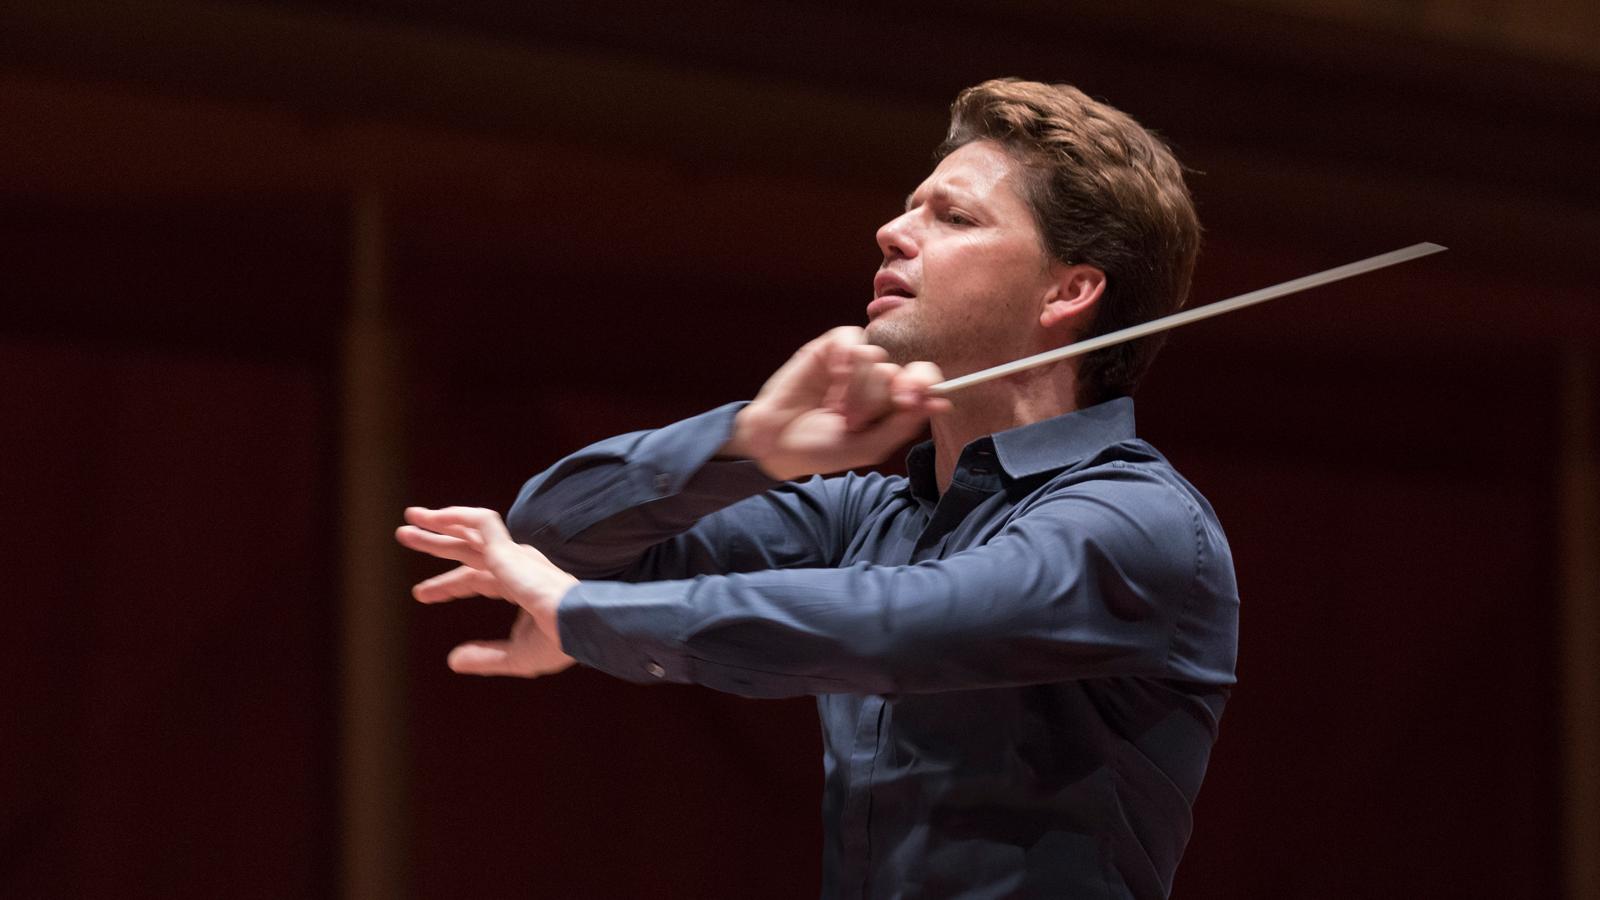 Unikum digger: Kristiansand Symfoniorkester